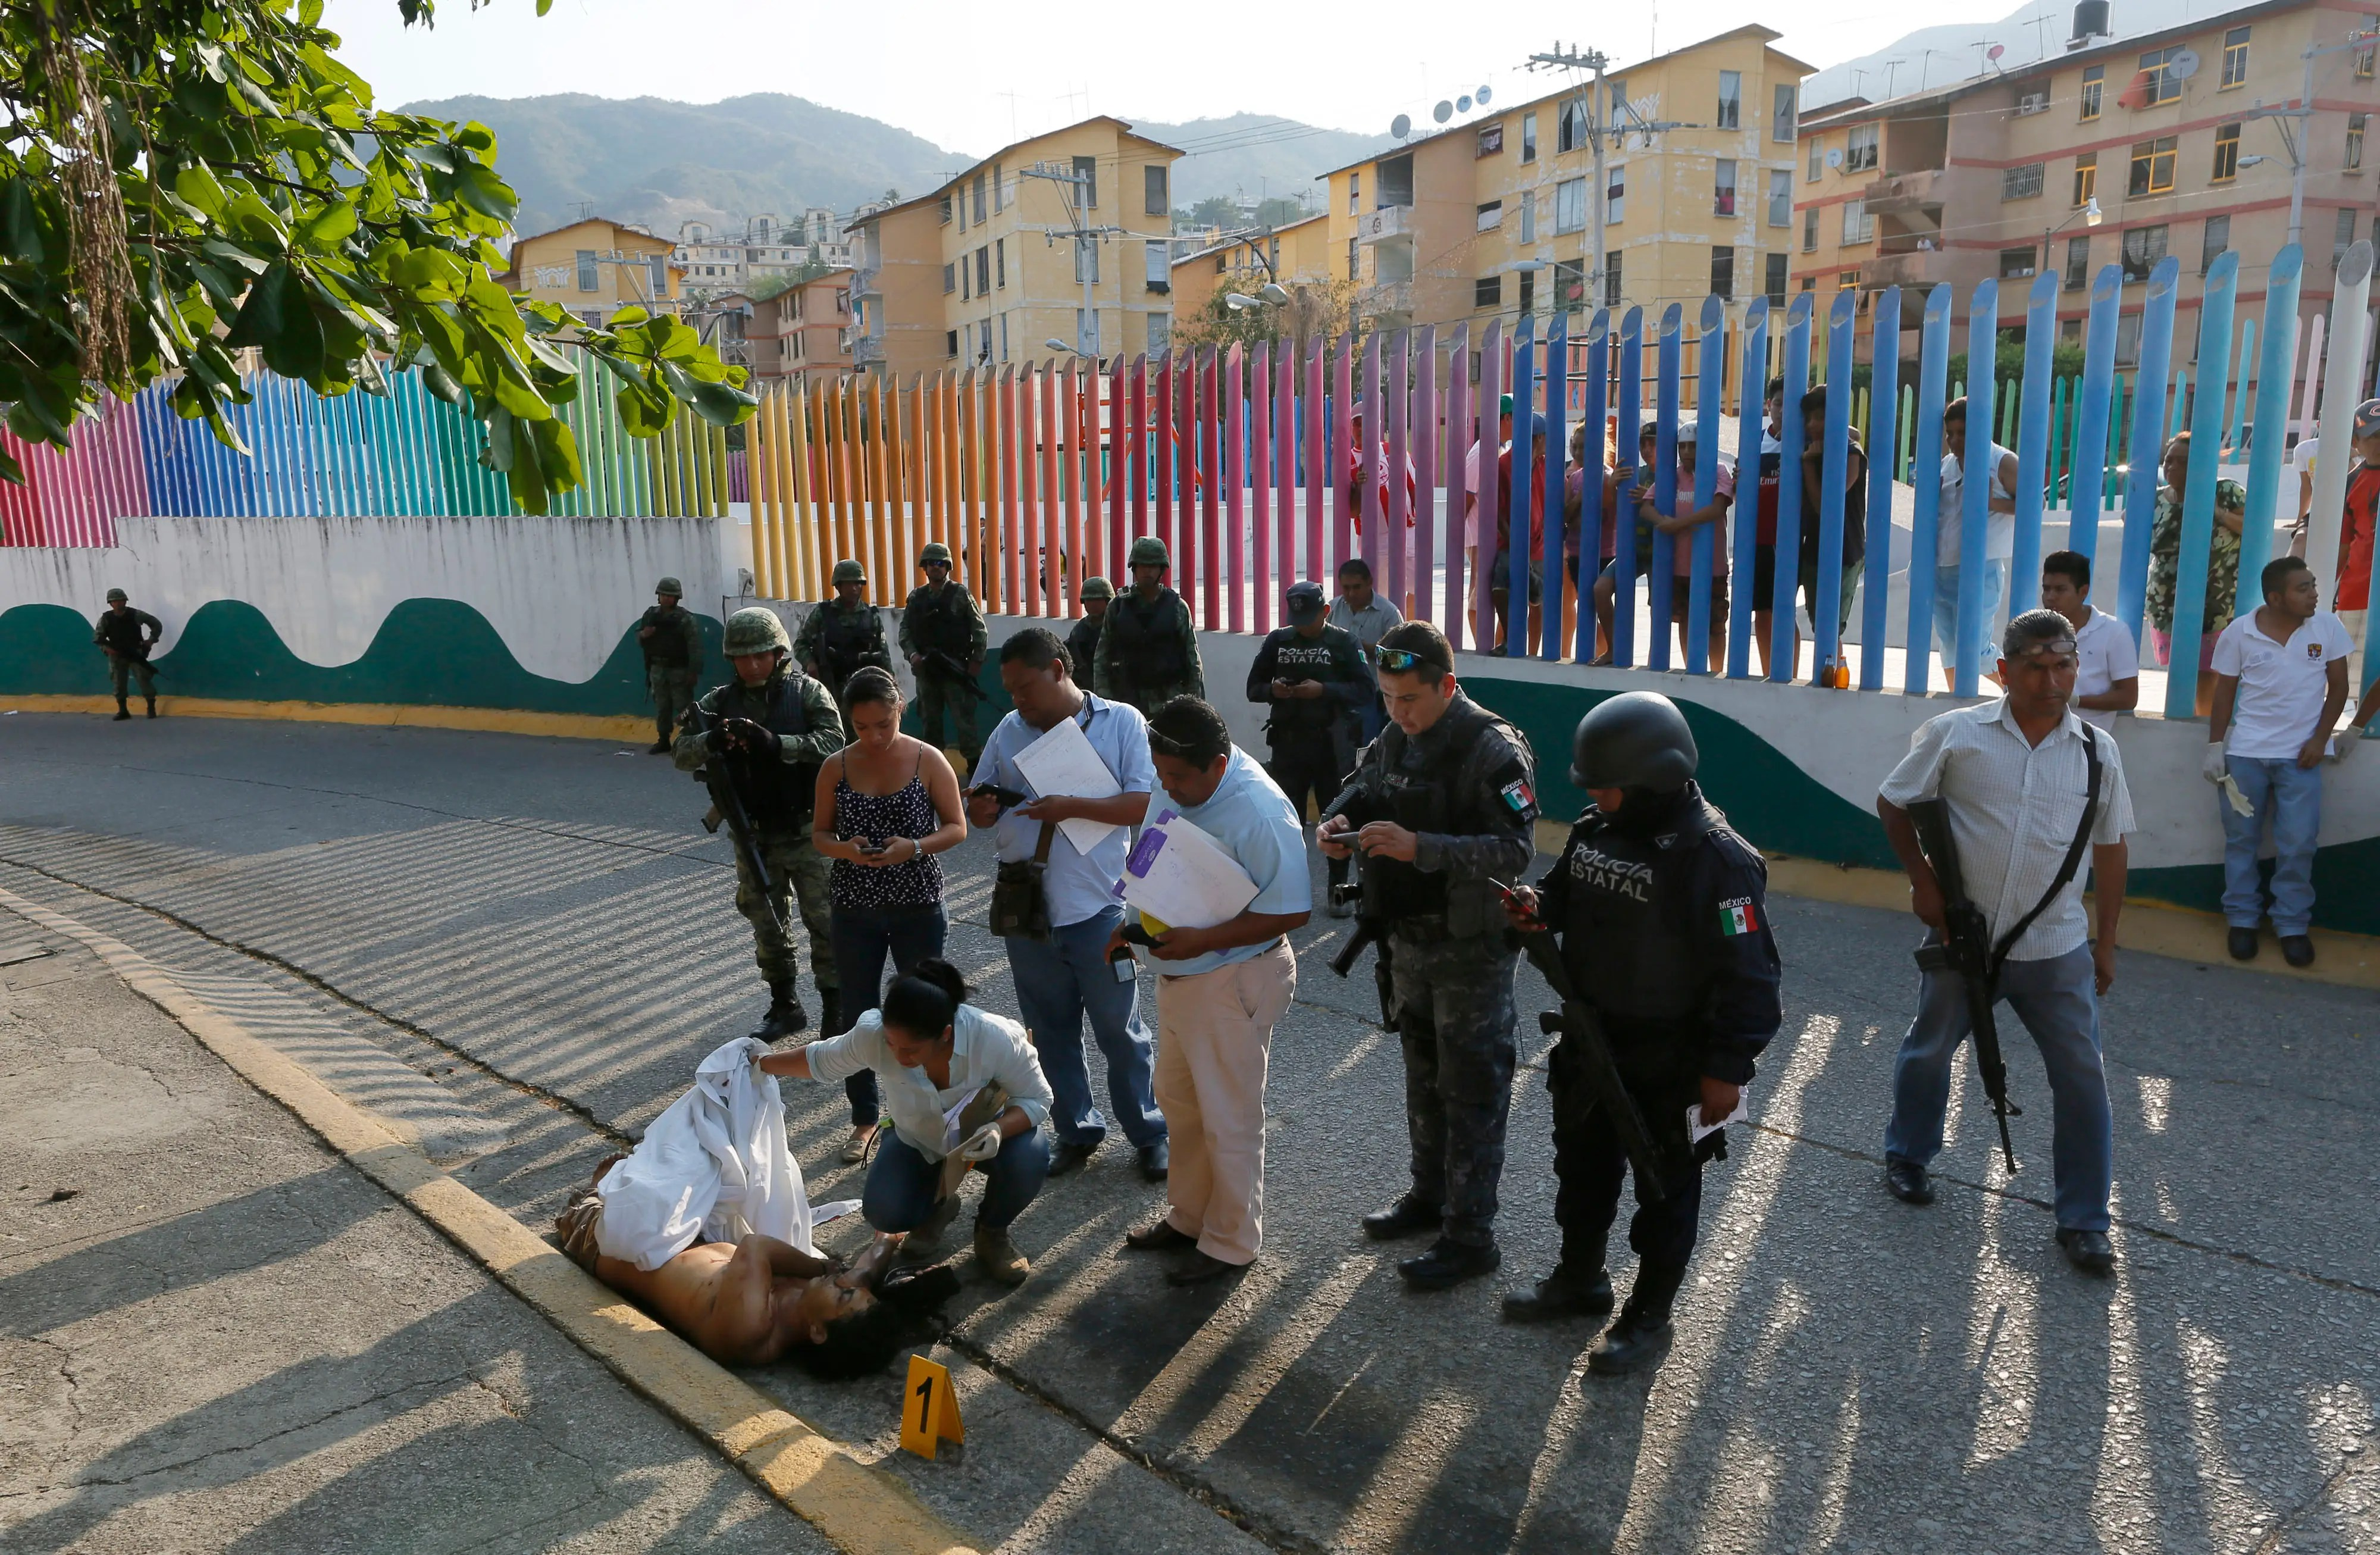 Acapulco Guerrero Mexico drug cartel criminal violence murder